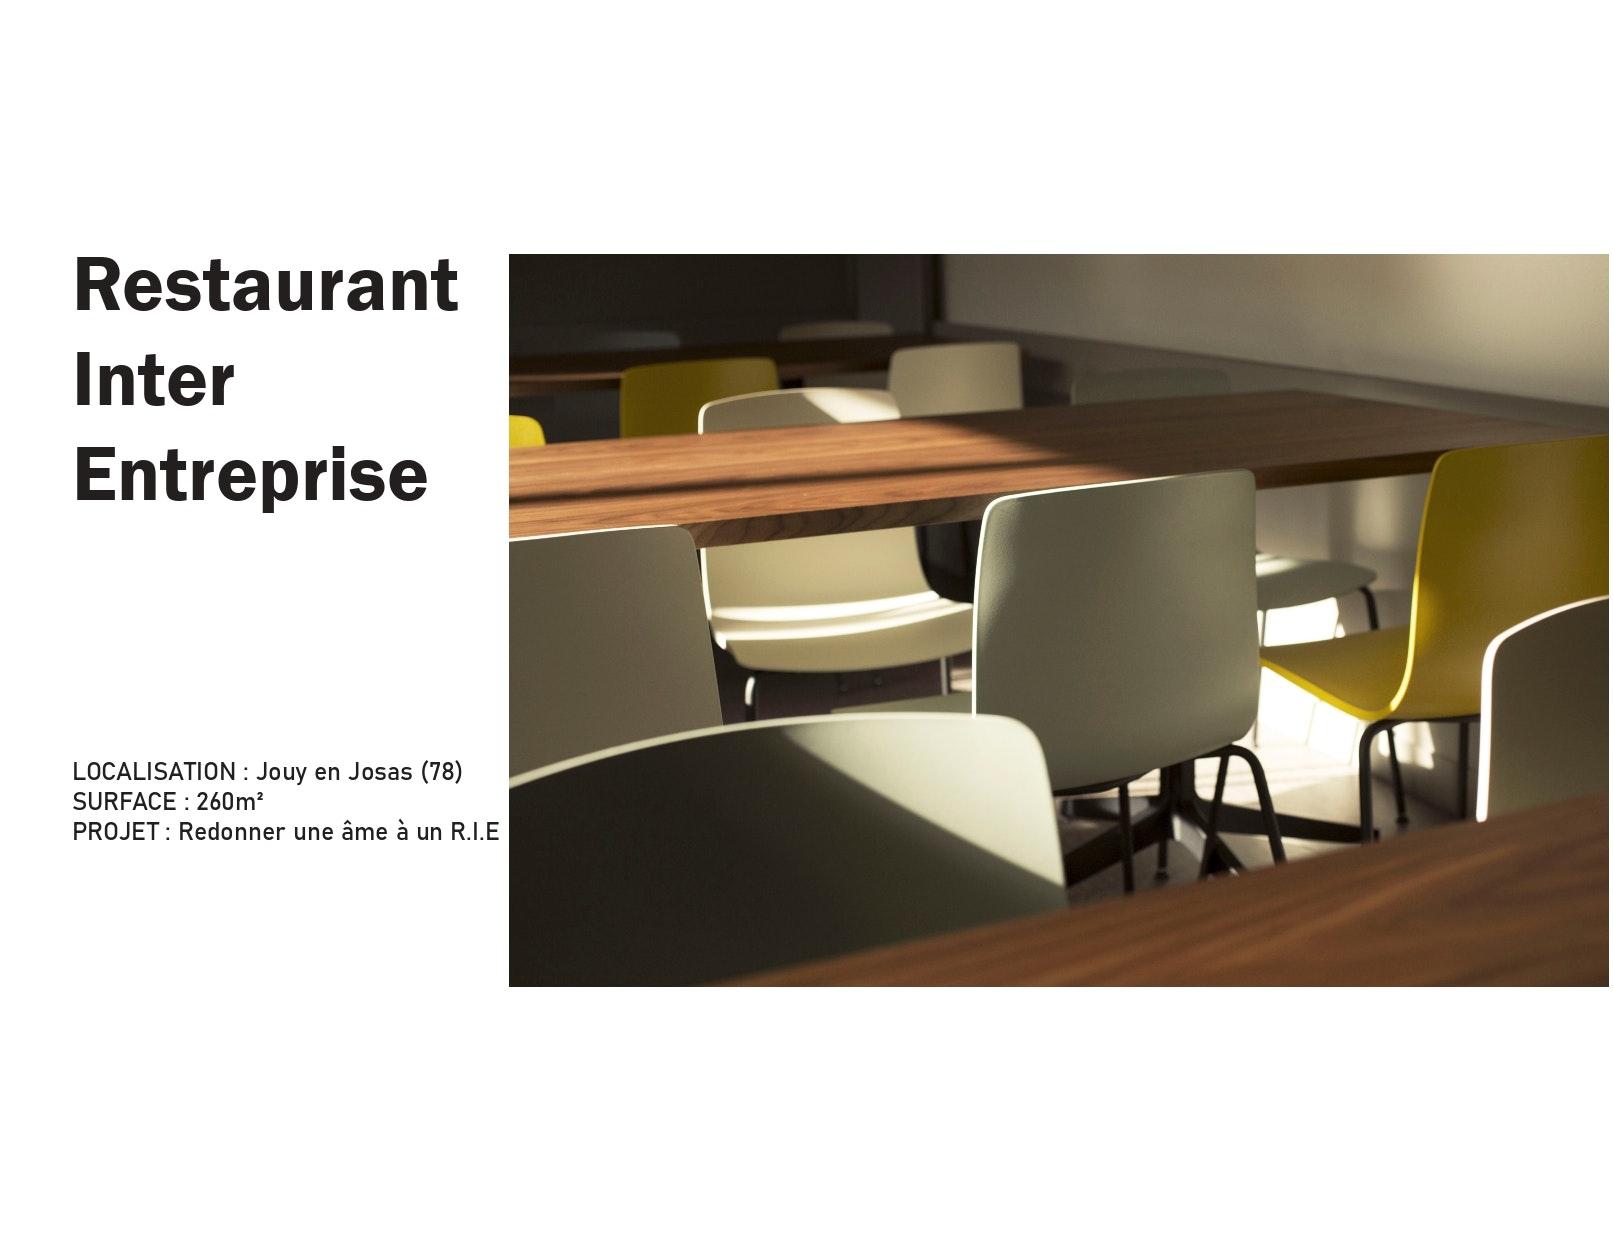 photo Restaurant Inter Entreprise Manon Le Gall - Architecte hemea